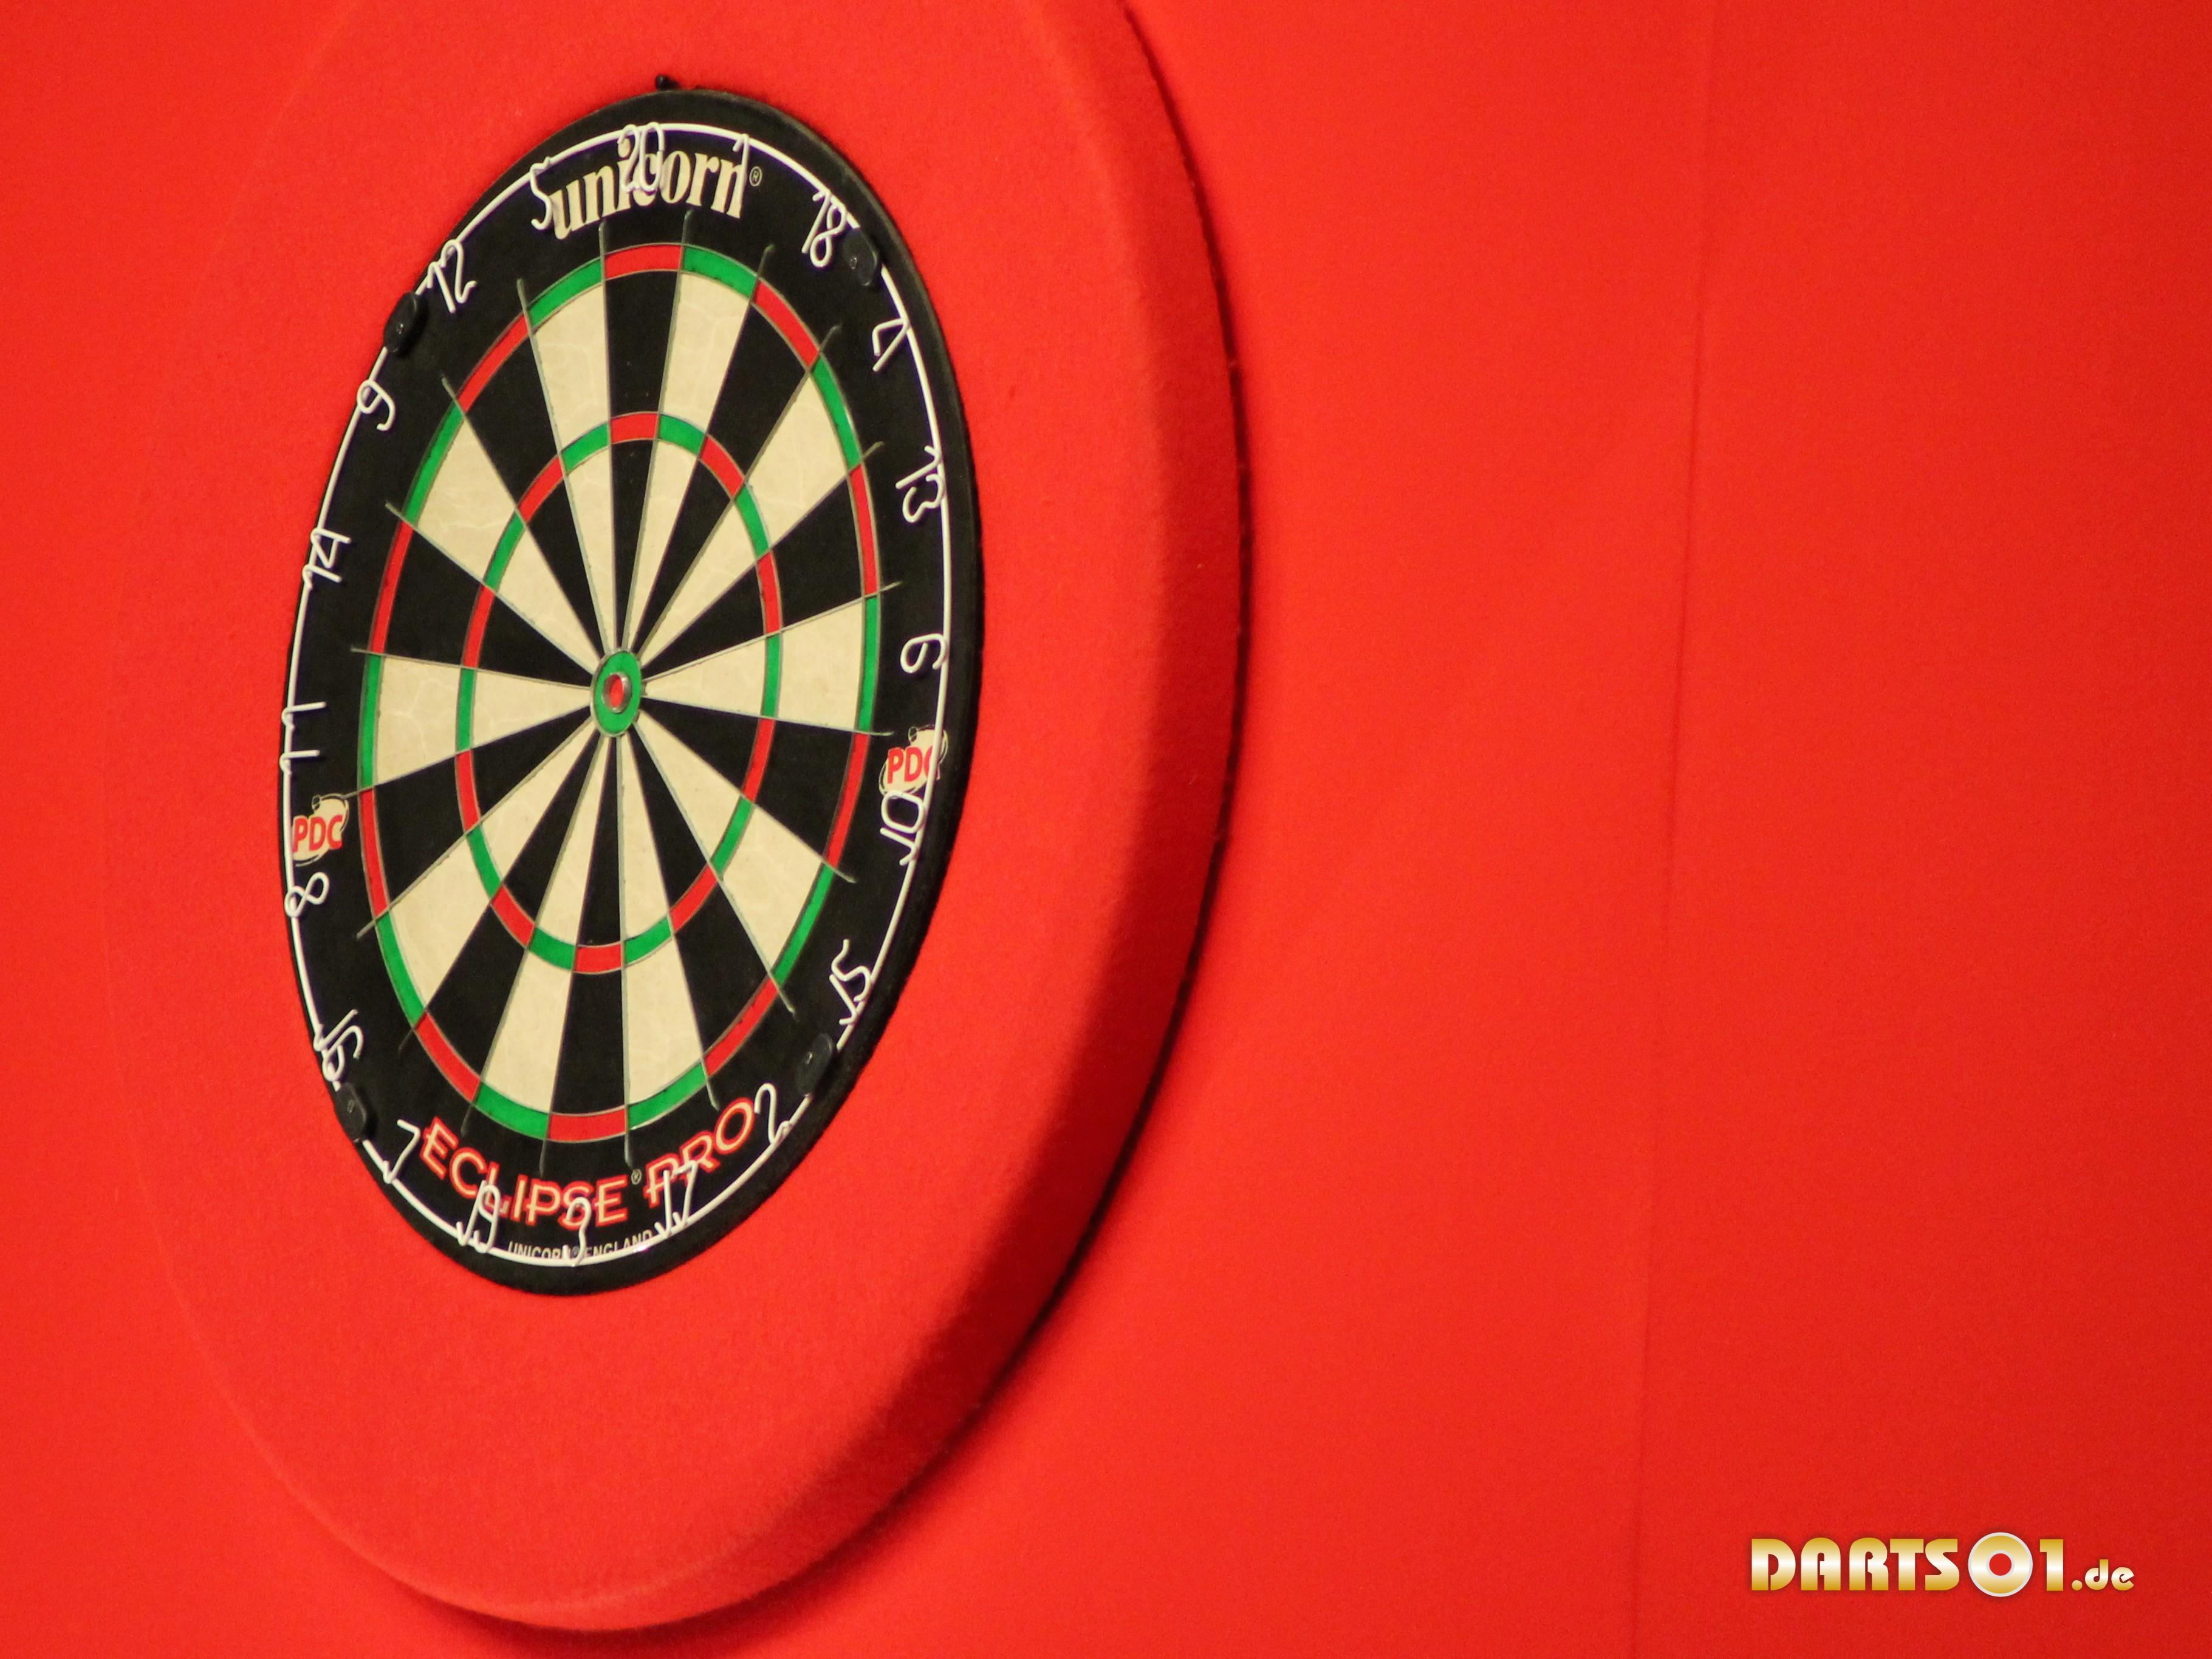 darts pdc